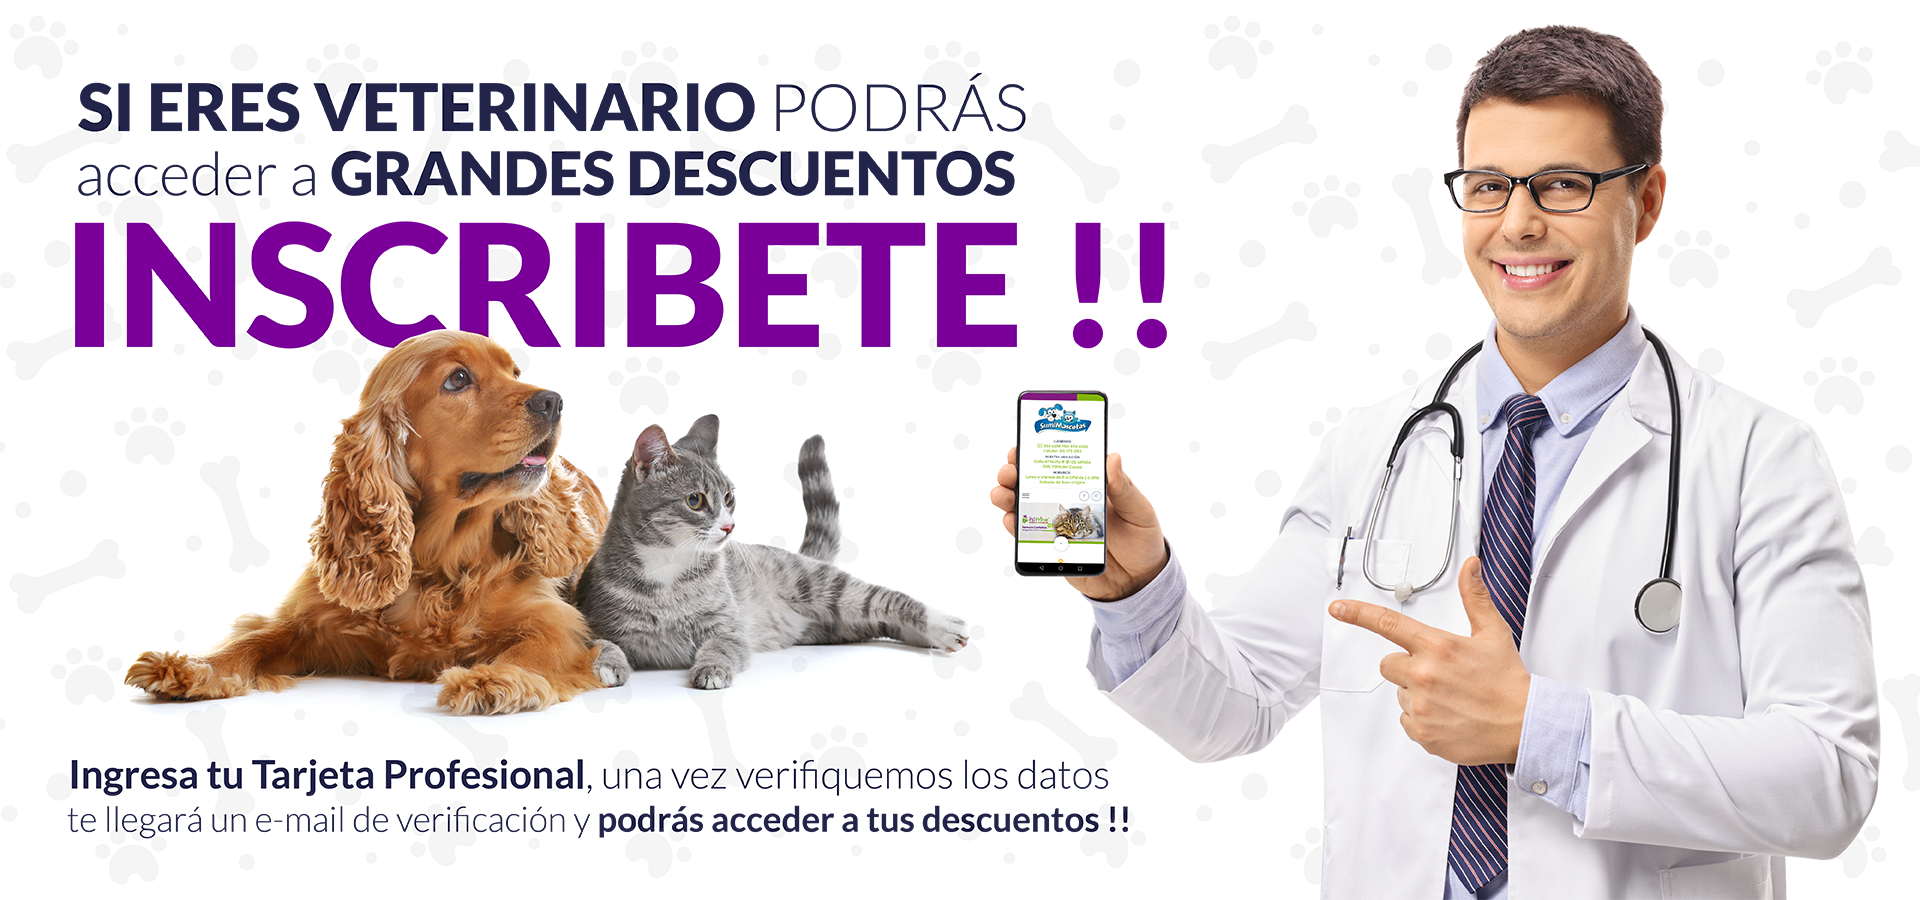 http://sumimascotas.com/wp-content/uploads/2018/11/Porpuesta-web-2-06-1920x900.png